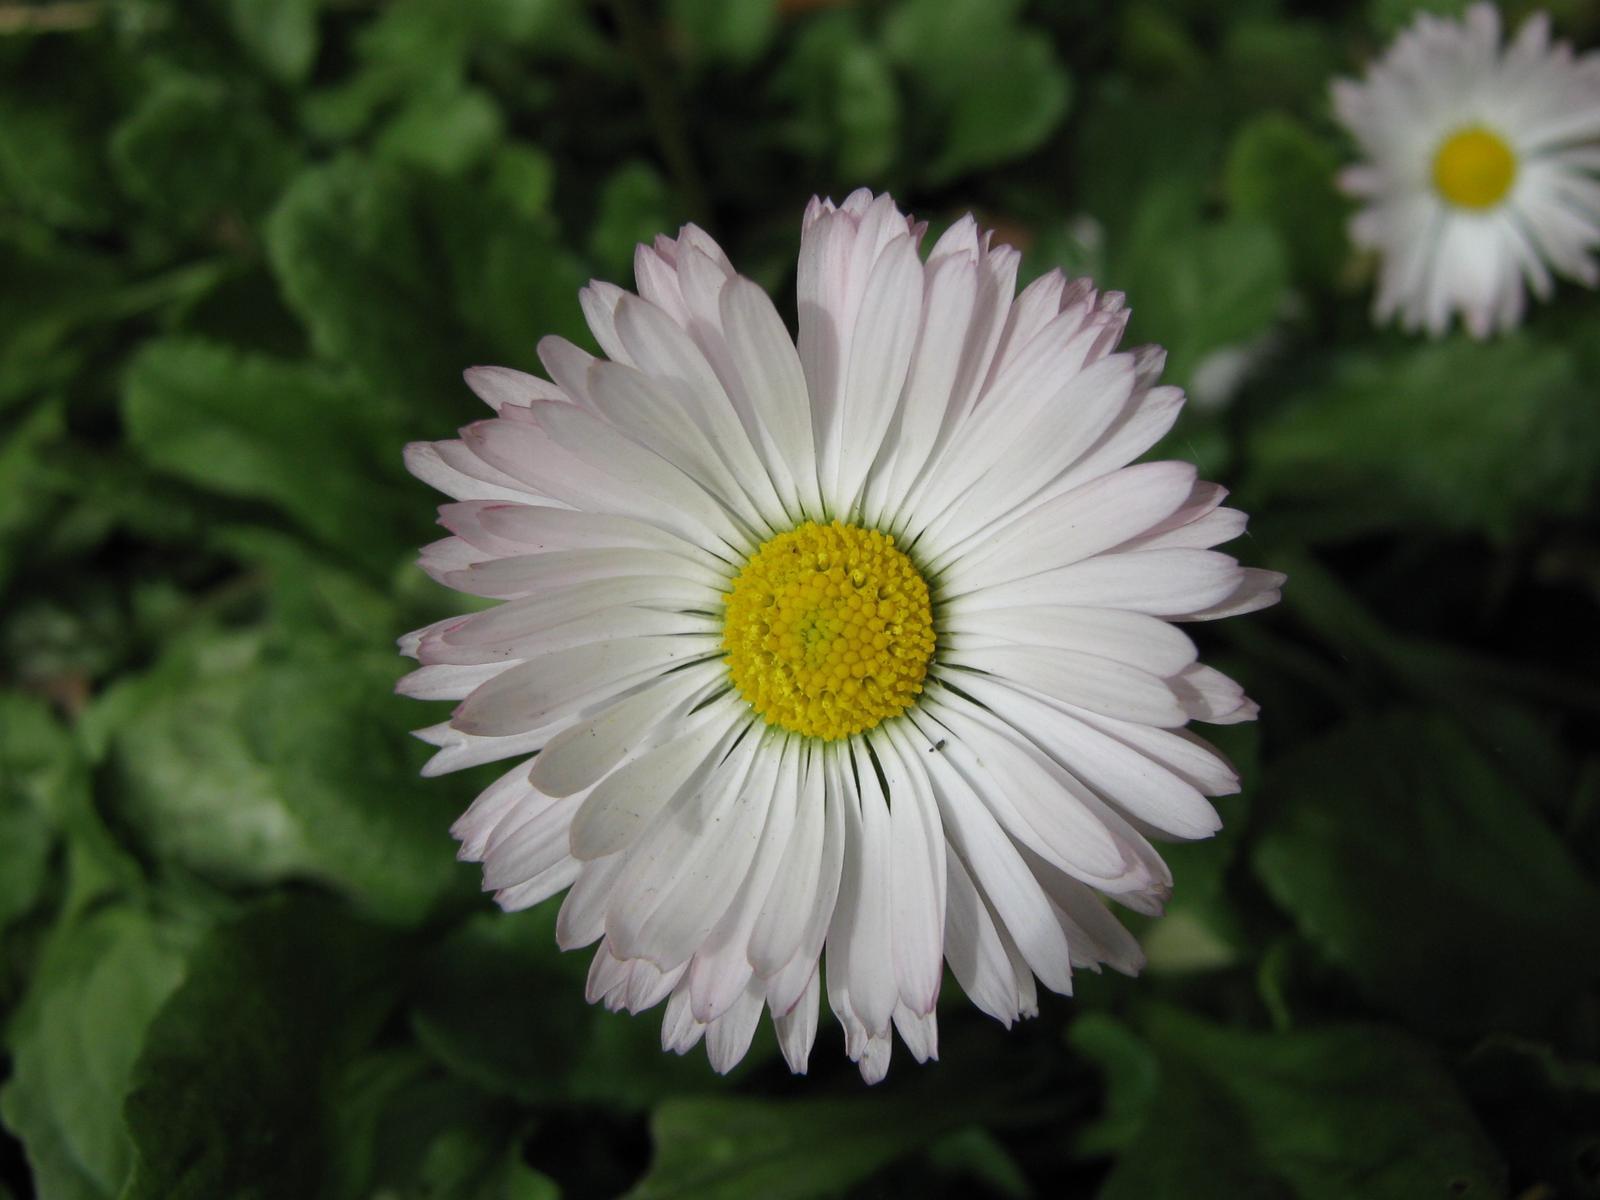 chamomile-flower-6-1600x1200